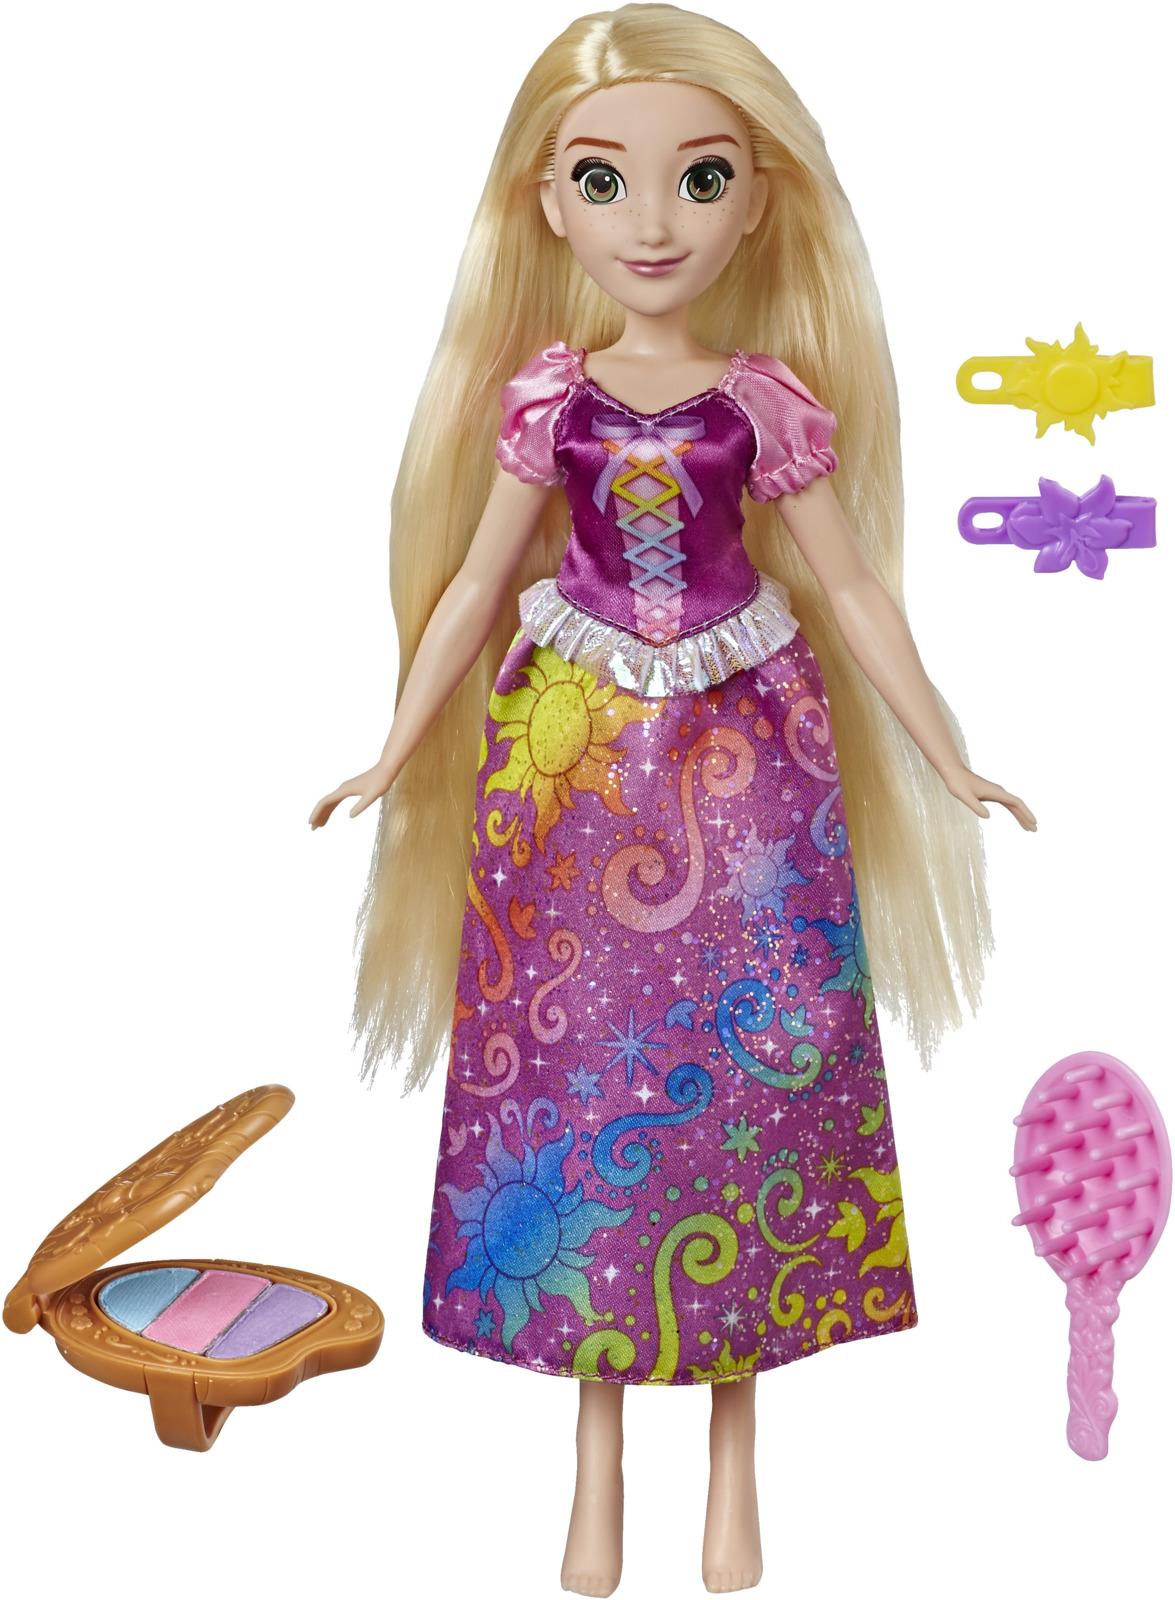 Кукла Disney Princess Classic Fashion Doll Asst Рапунцель, E4646EU4 цены онлайн